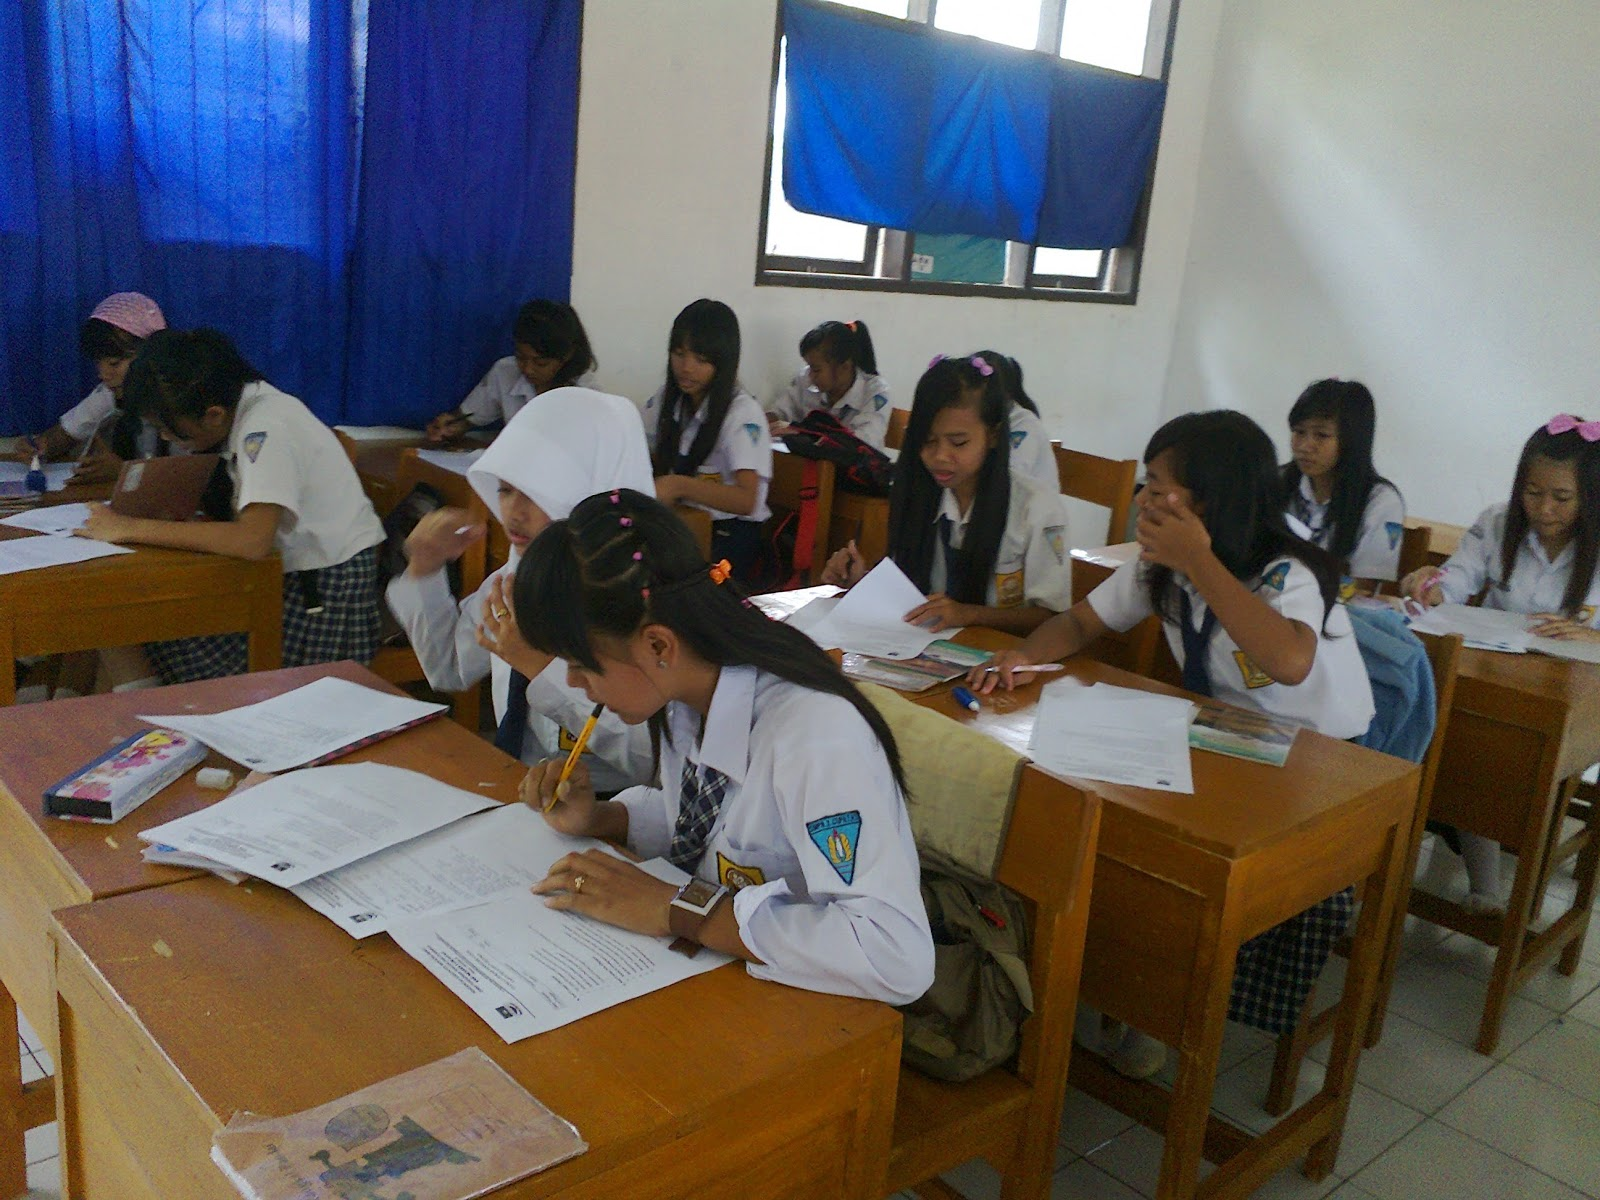 Js Aries Blog Soal Ulangan Harian Pkn Kelas Ix Ototomi Daerah